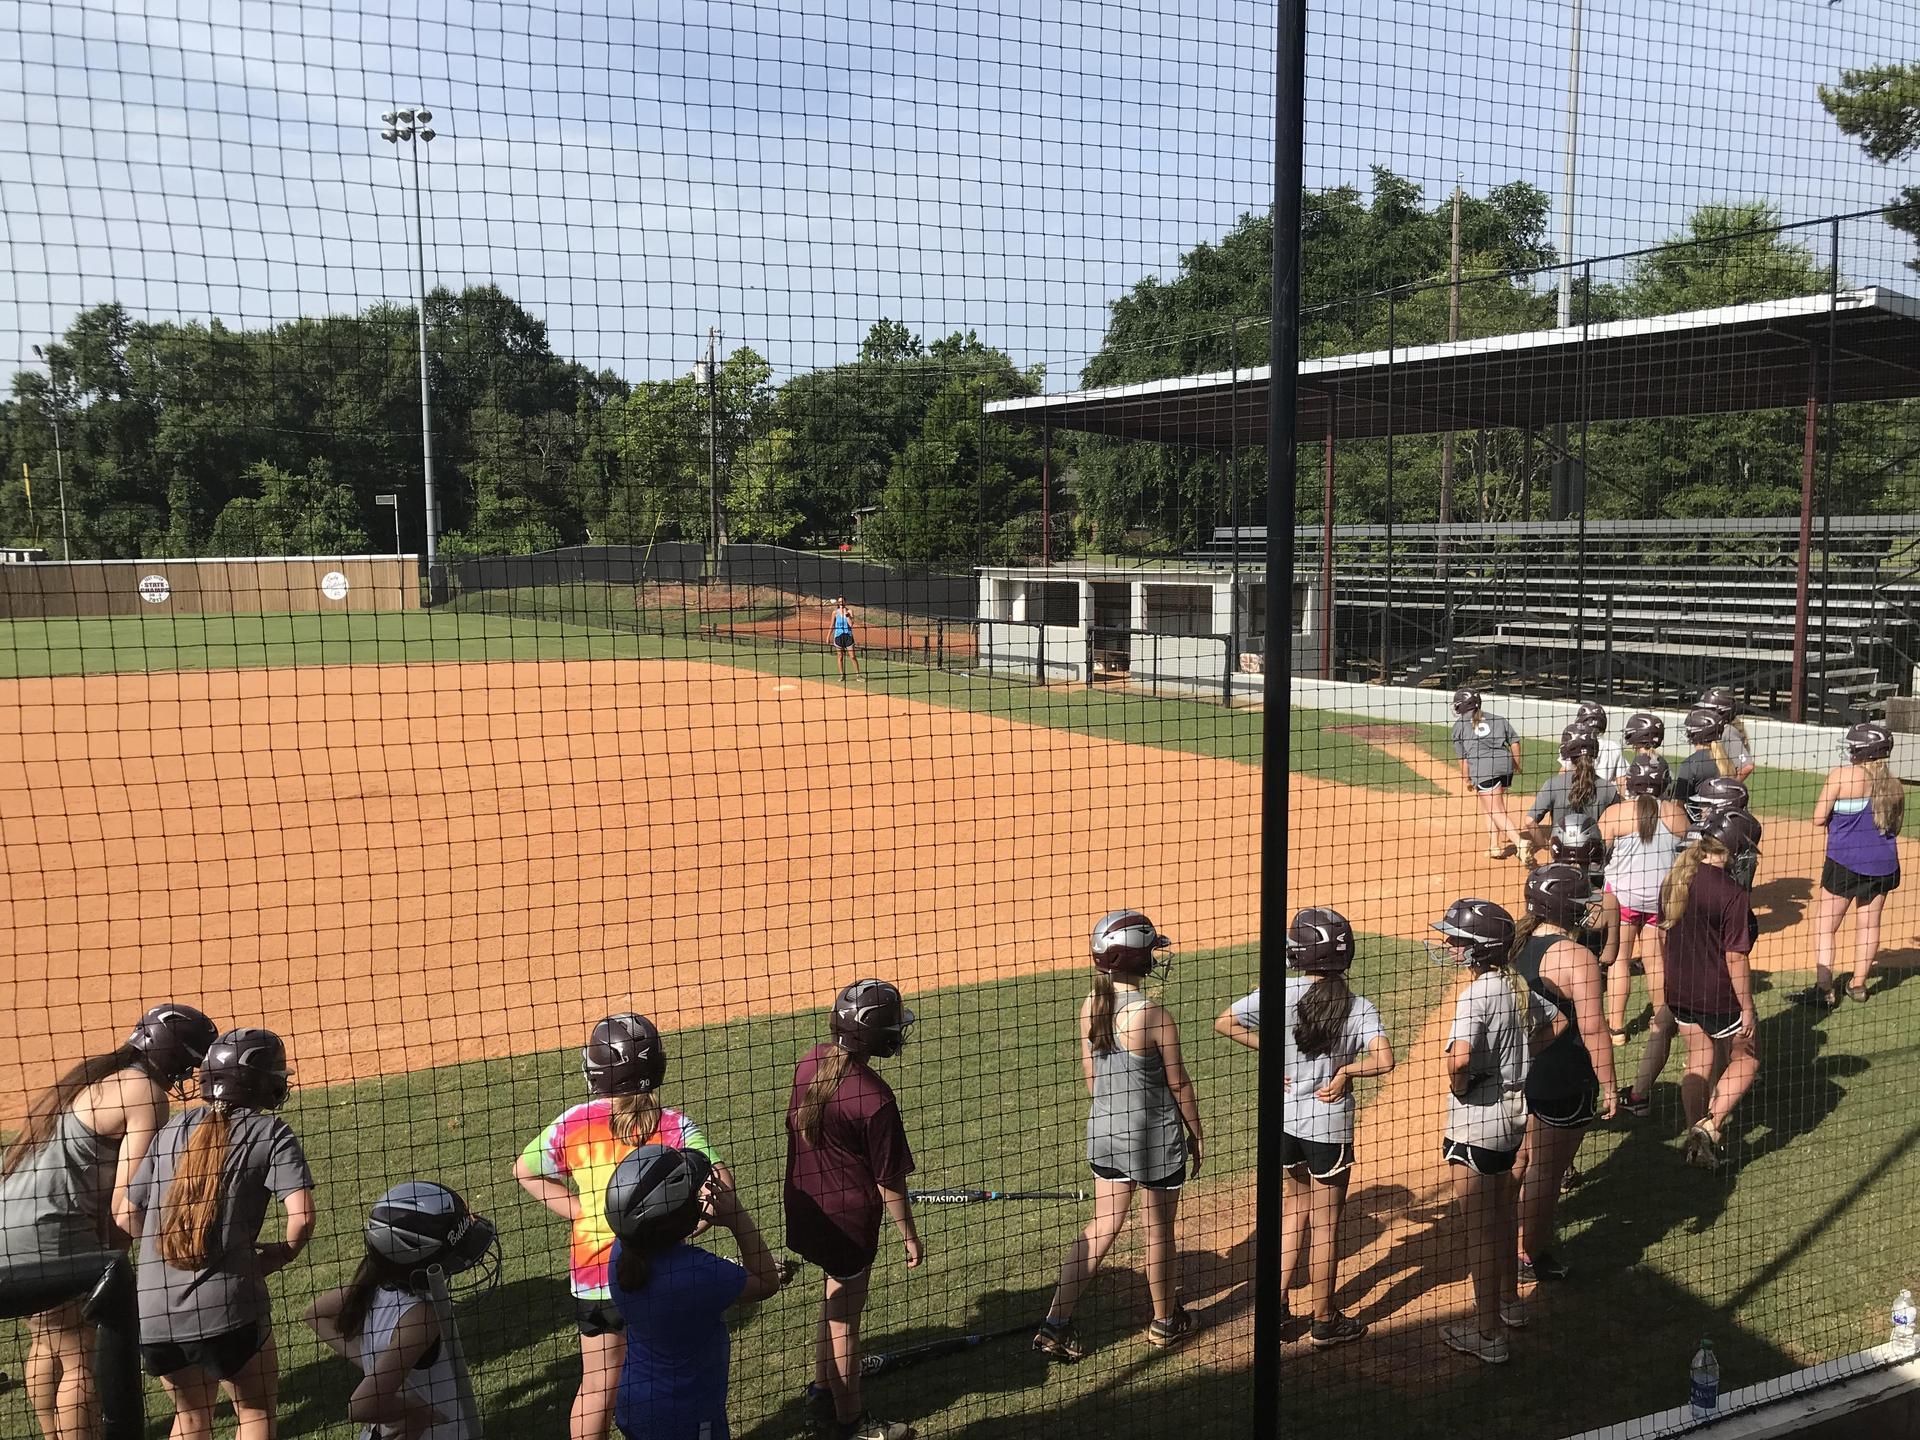 Clarkdale Softball Practice